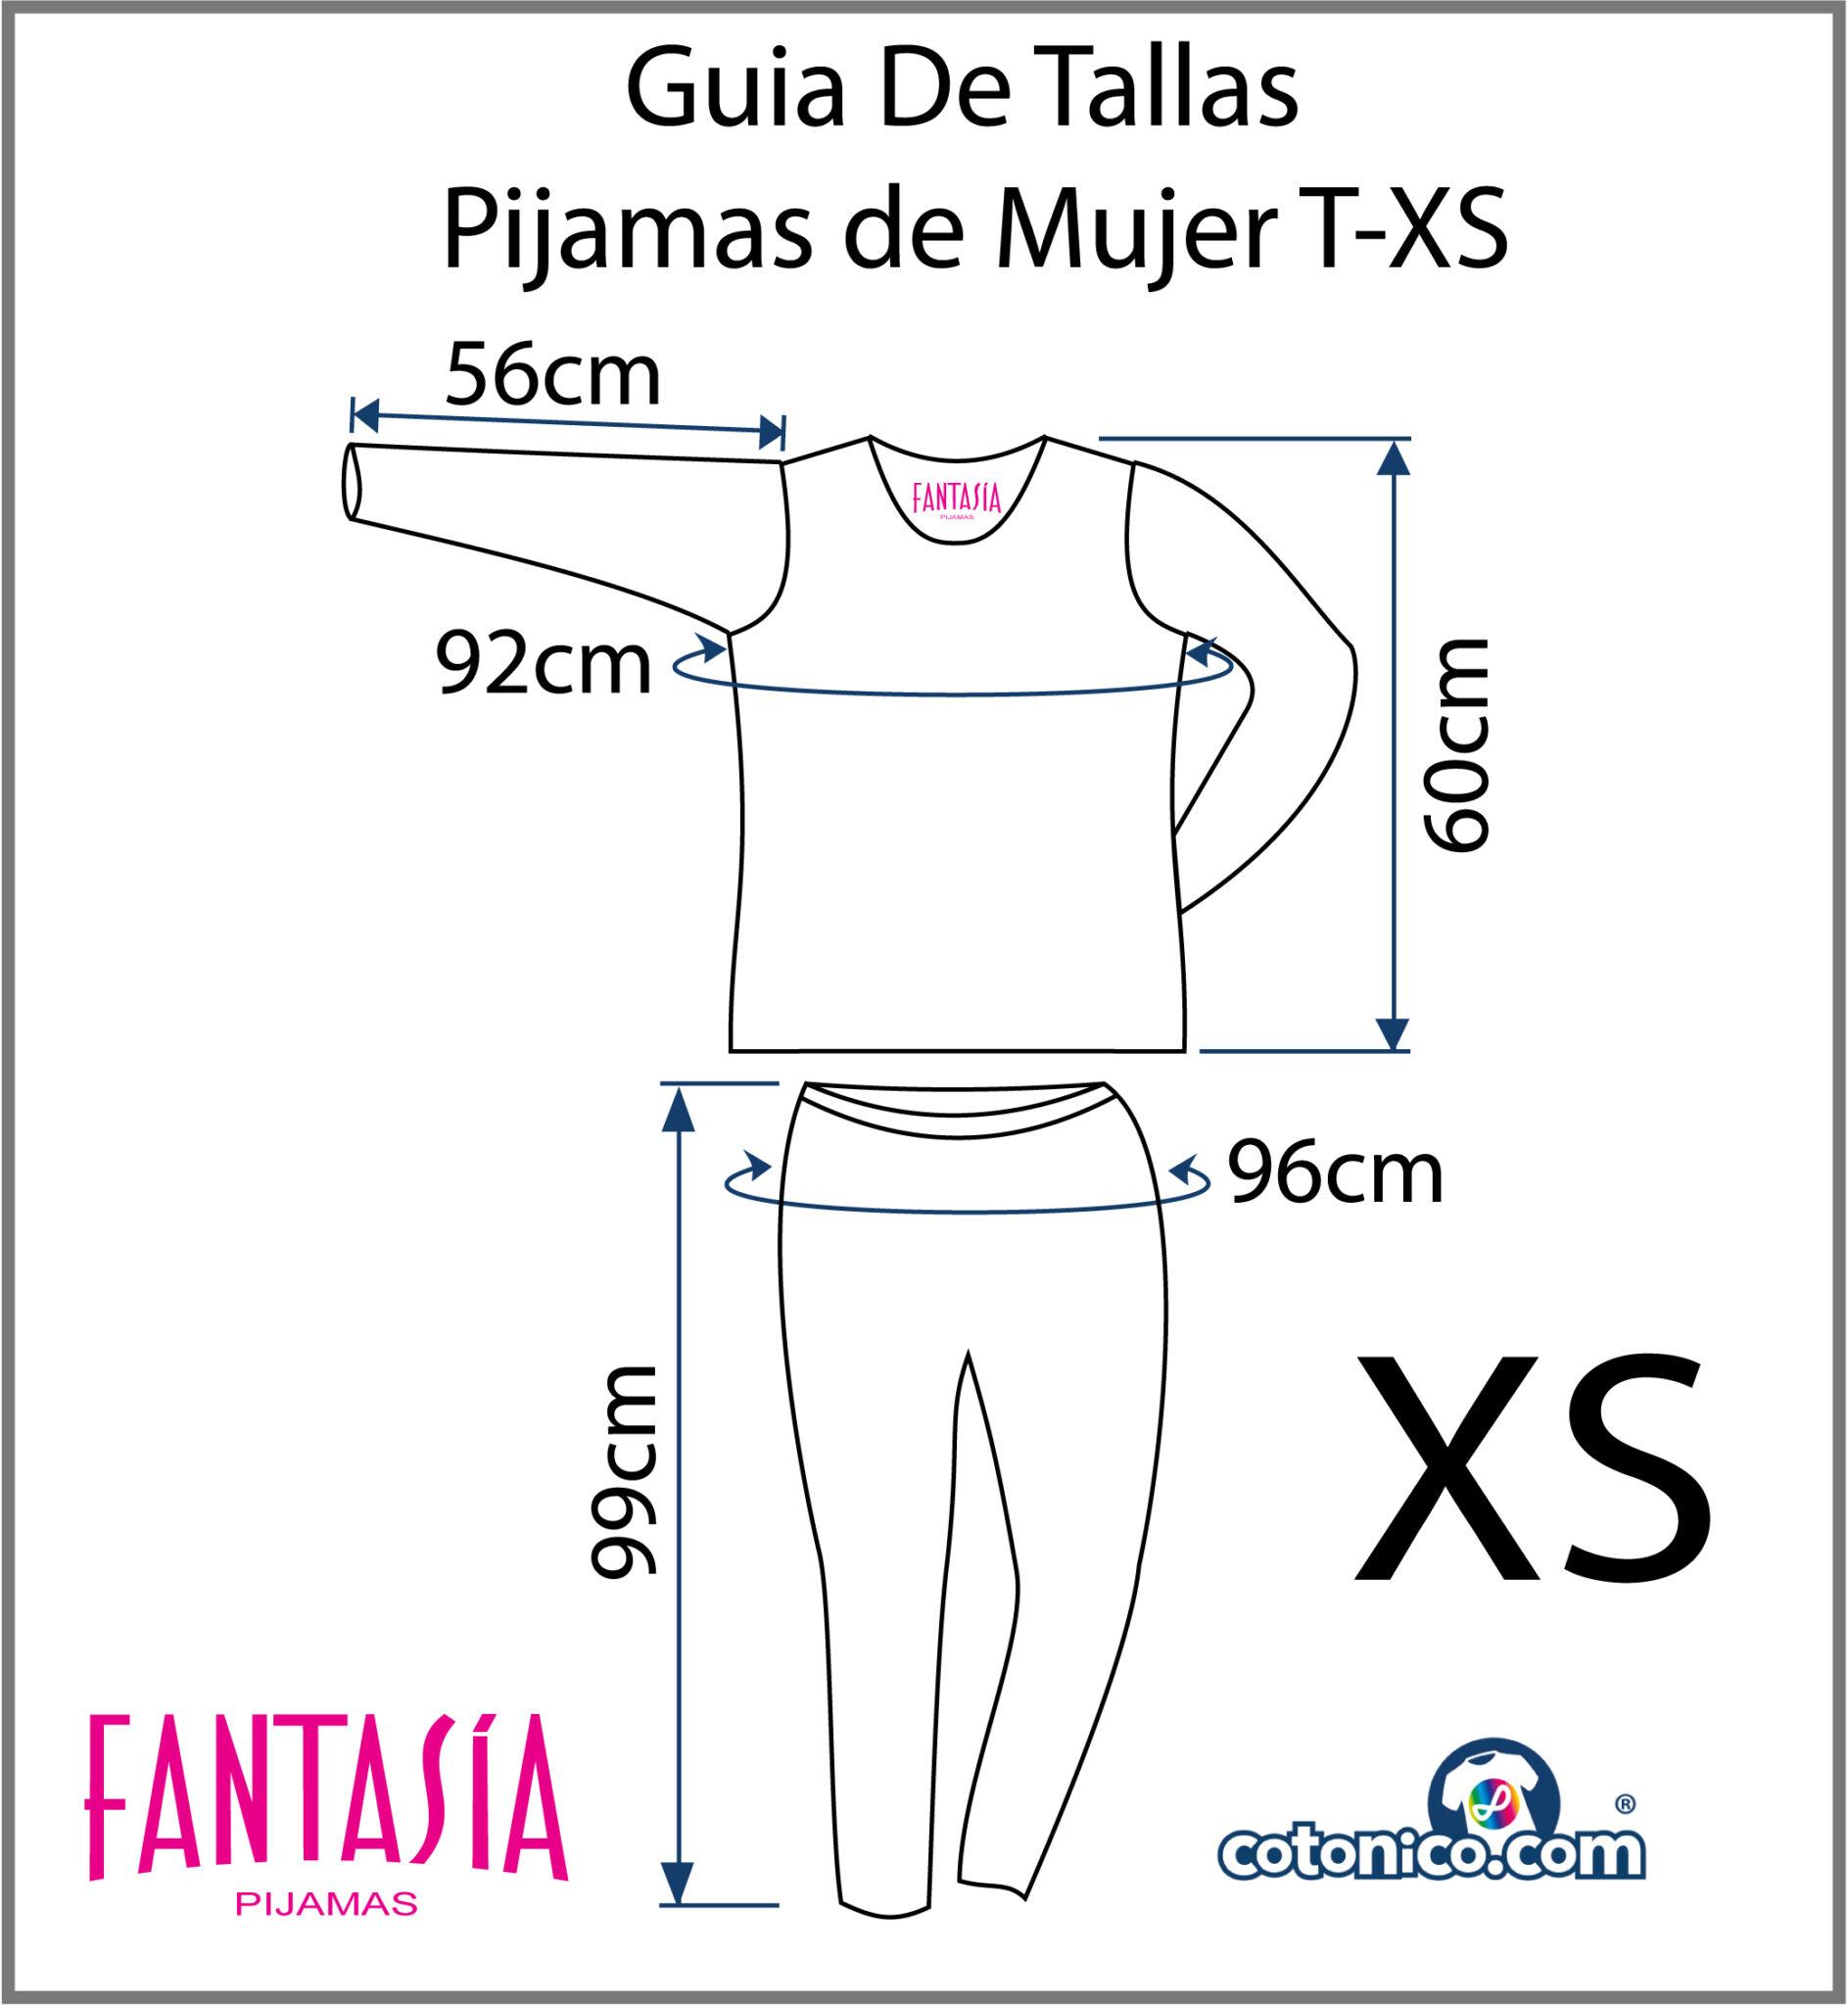 Guia-De-Tallas-Pijamas-De-Mujer-XS